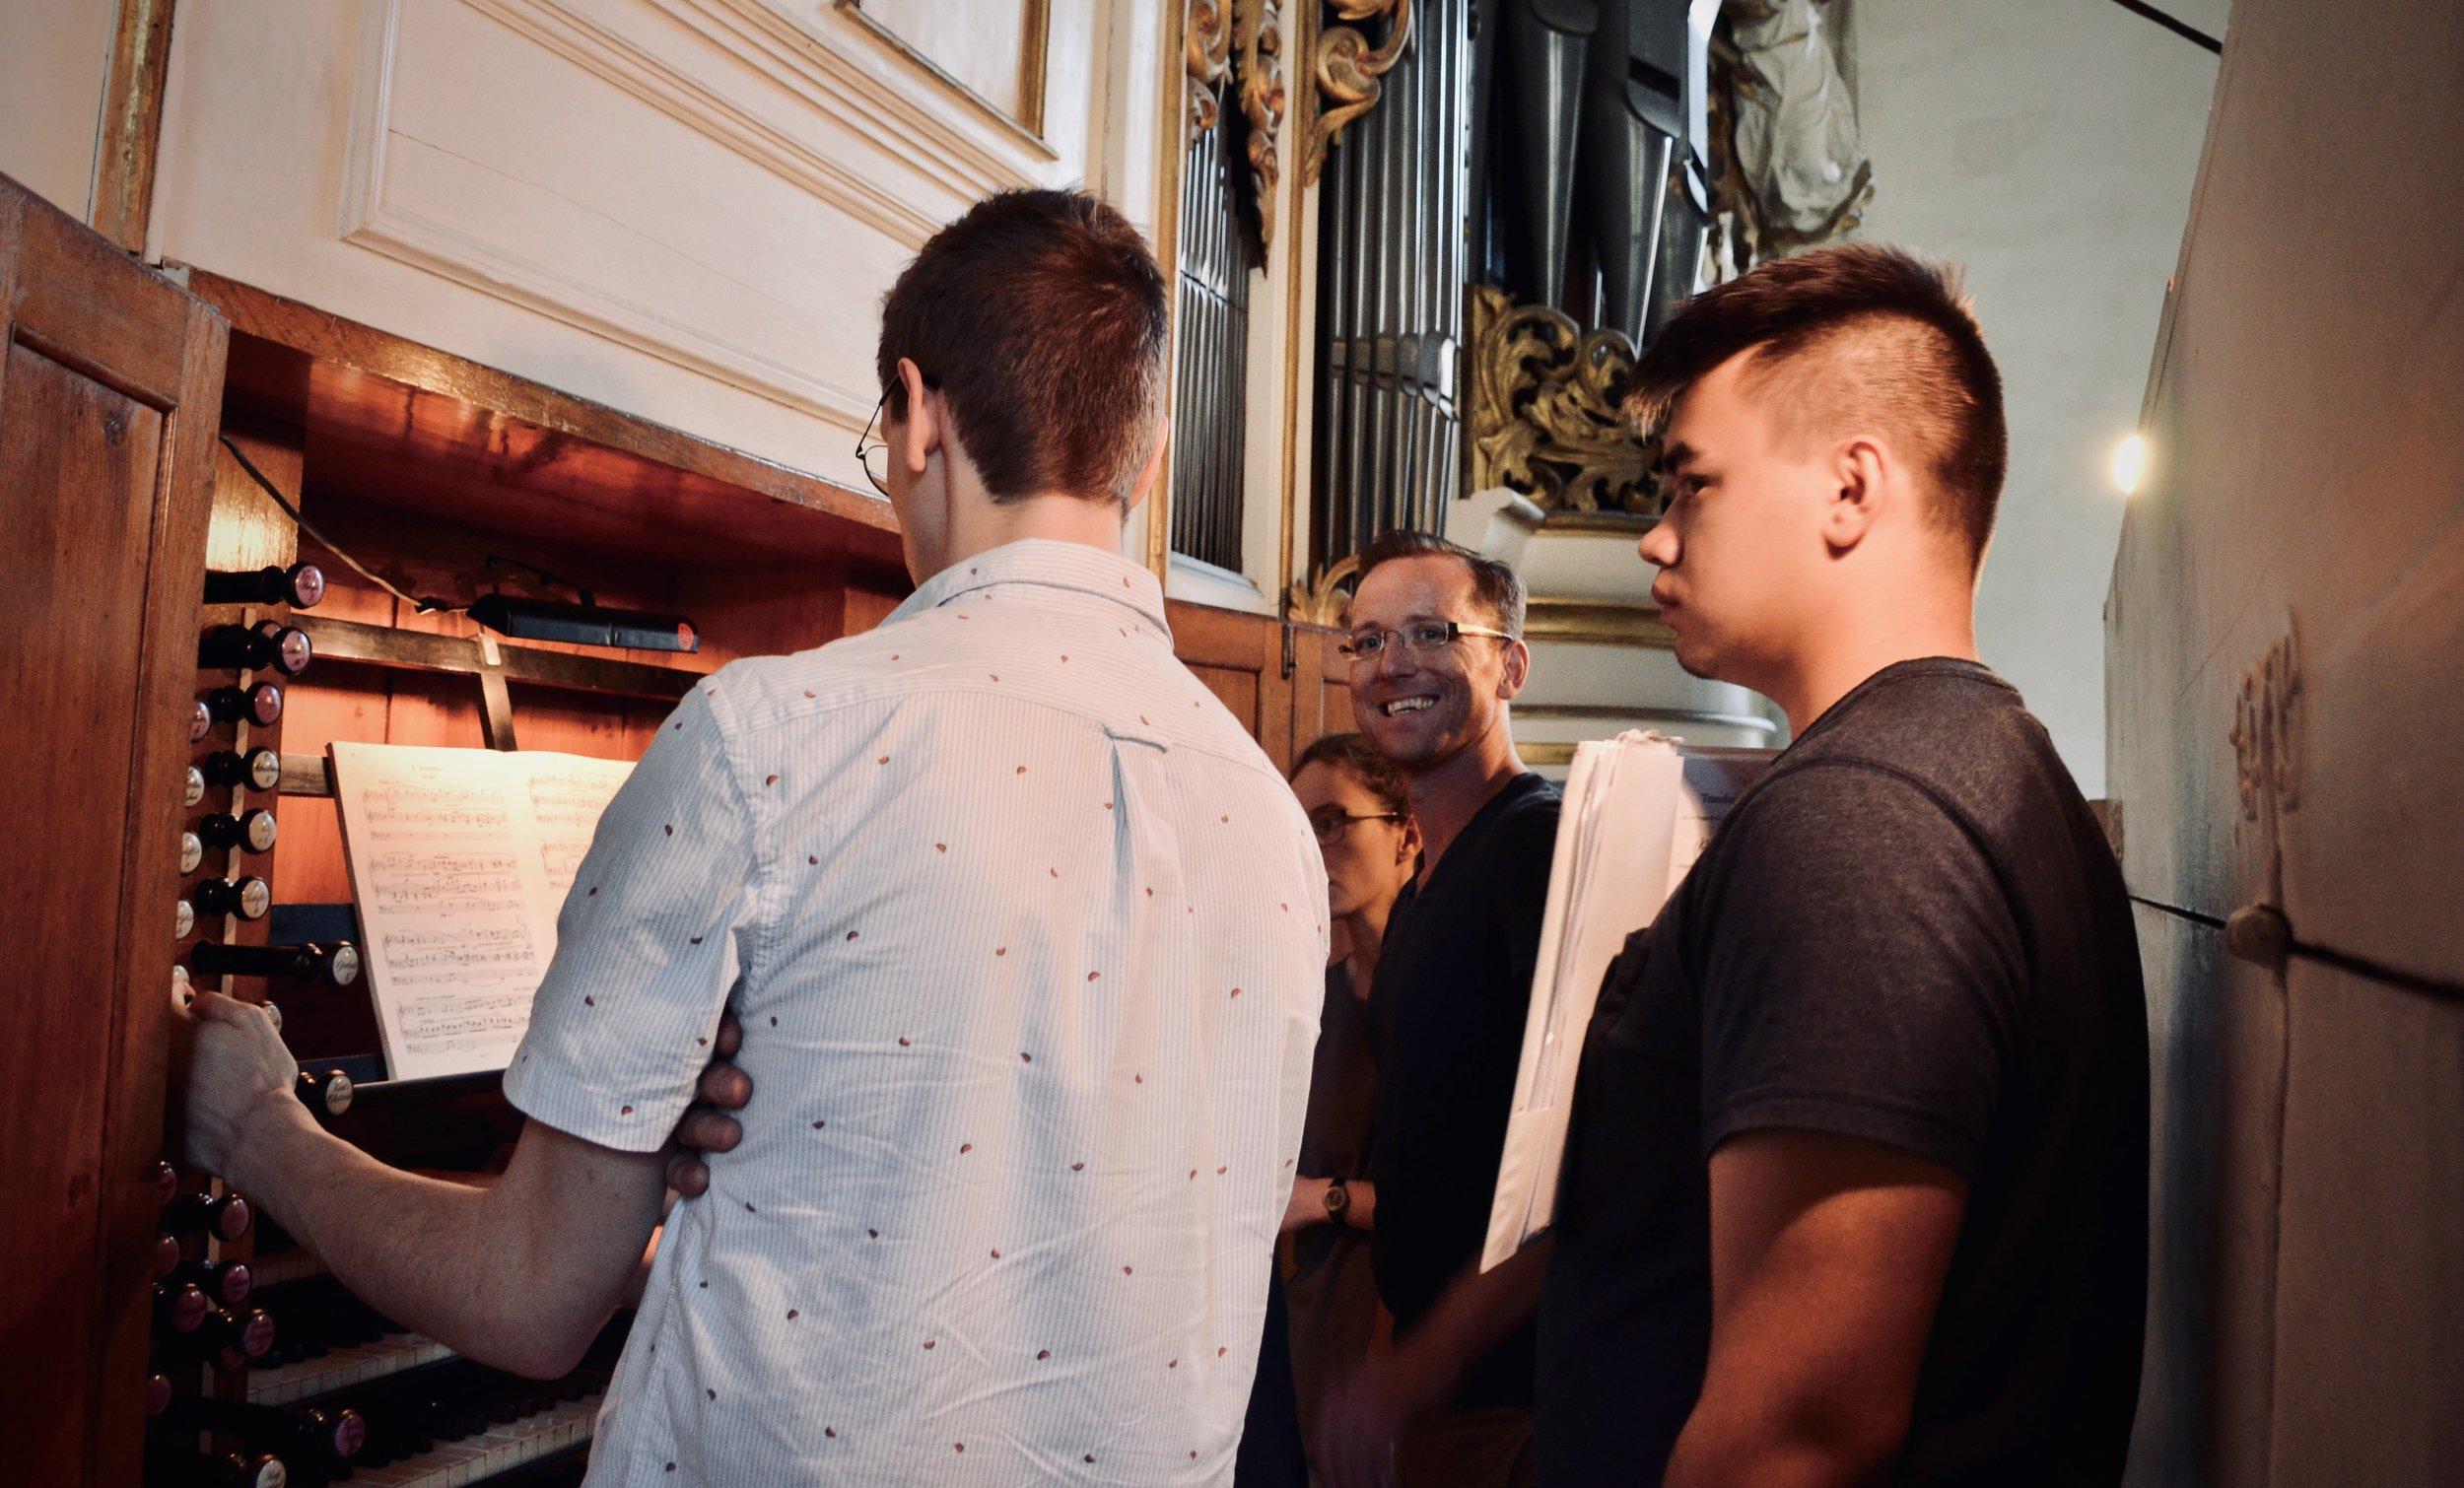 Christian Lane enjoys the 1855 Ladegast Organ, Merseburg Dom.